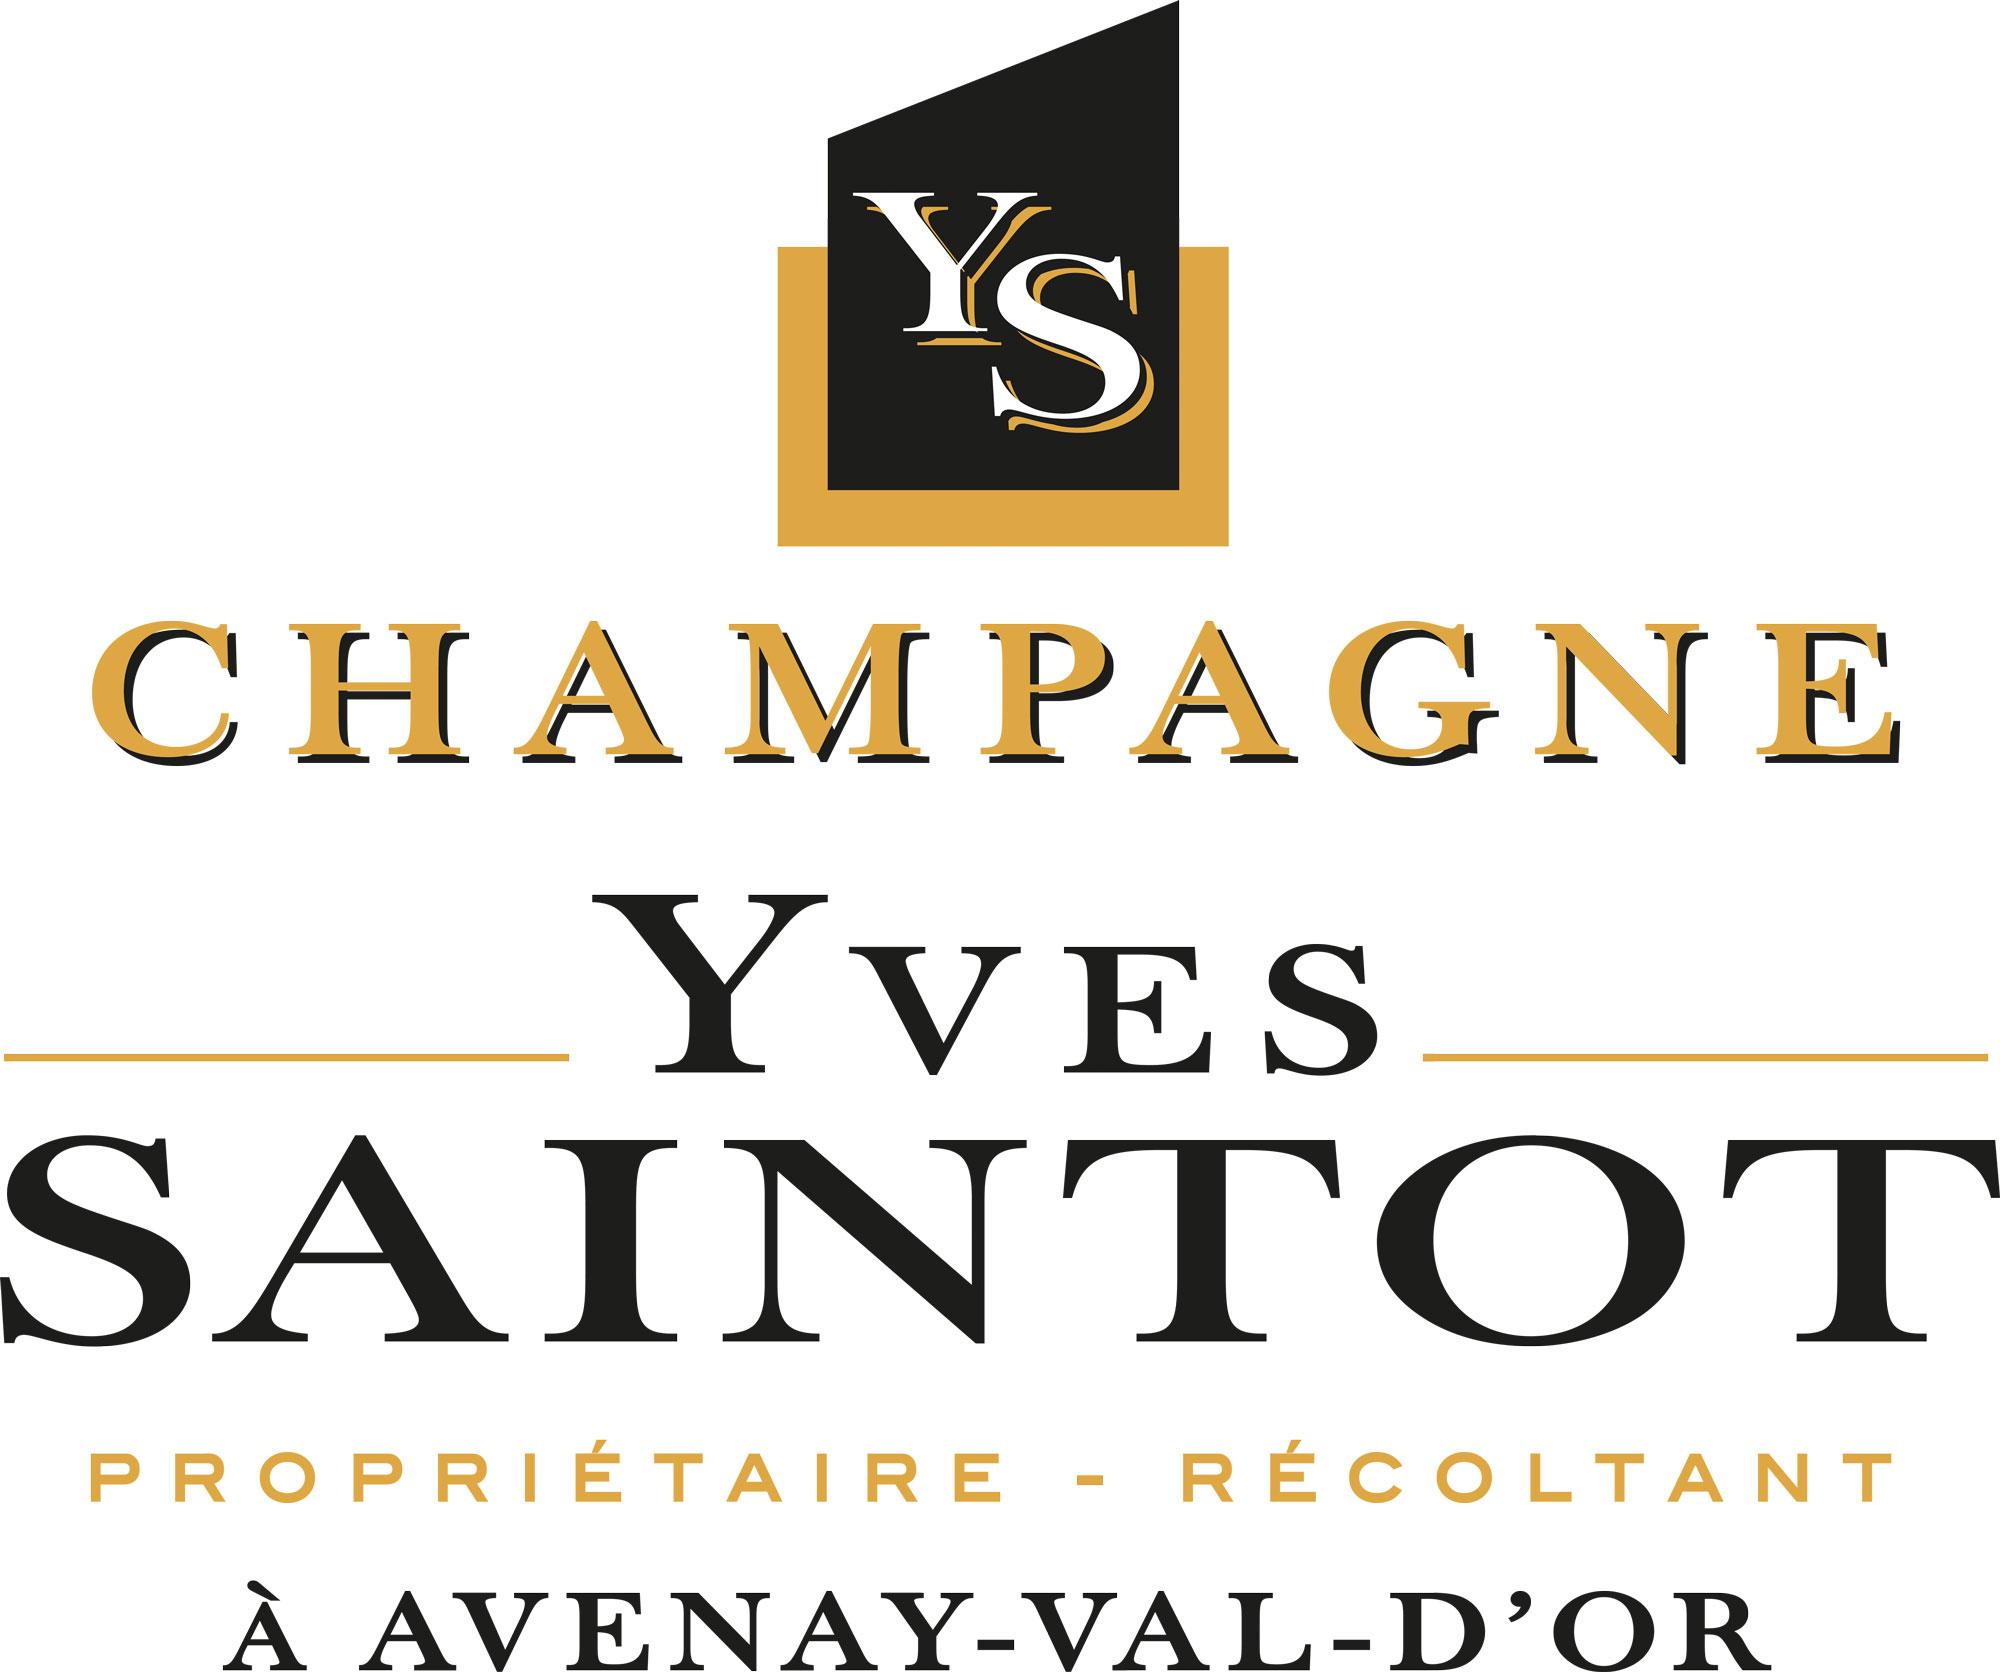 Champagne Yves Saintot